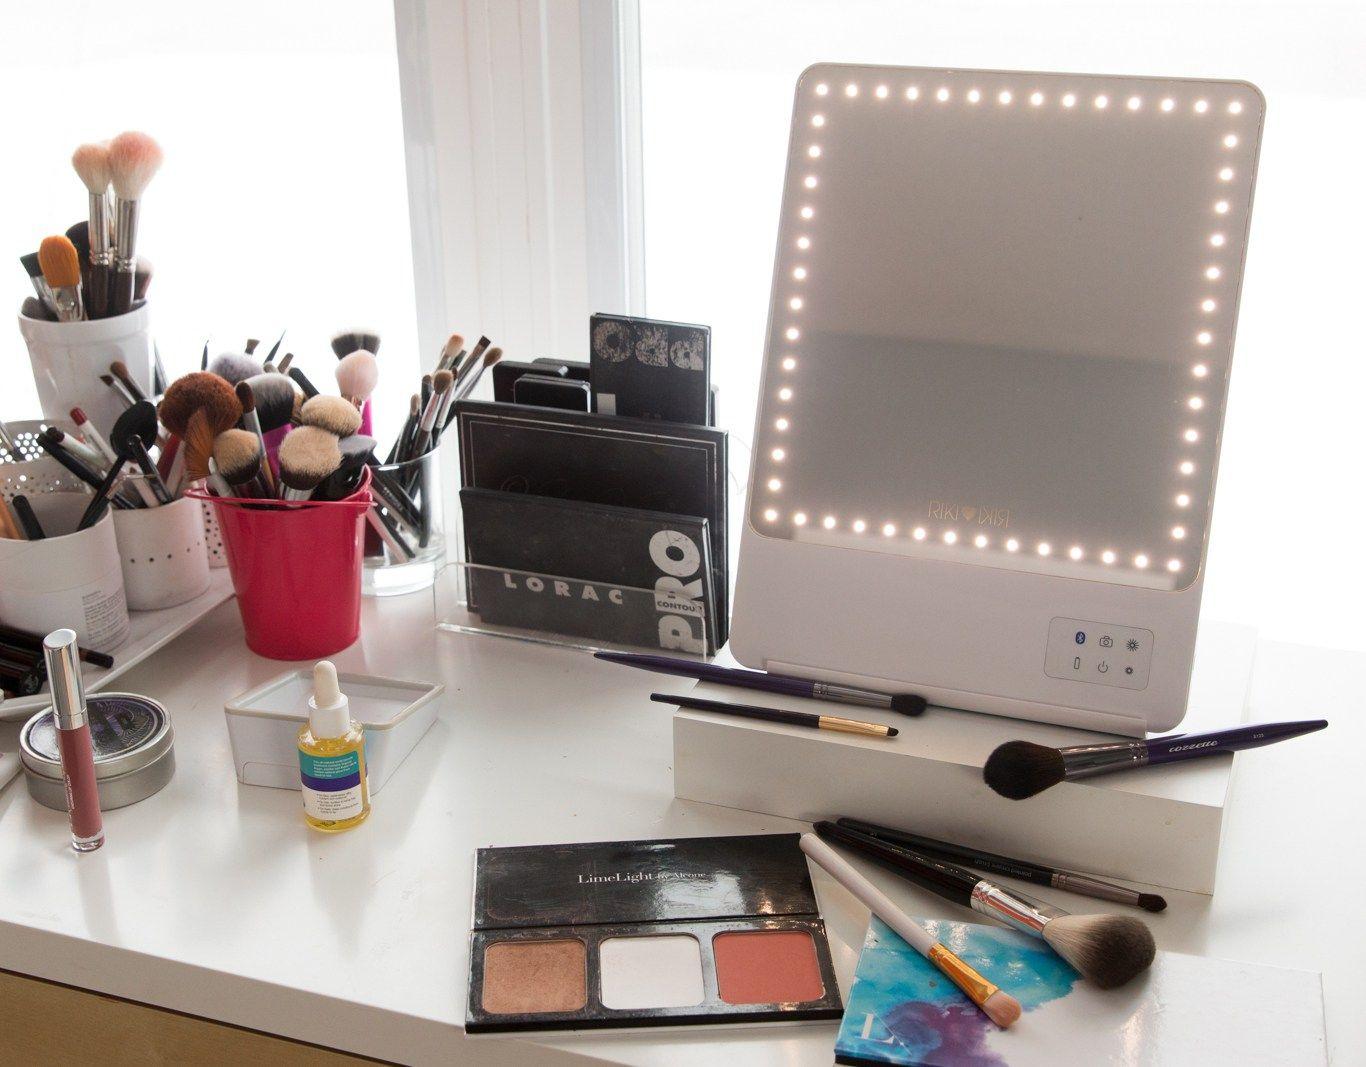 Glamcor Riki Skinny Mirror Review Riki skinny mirror